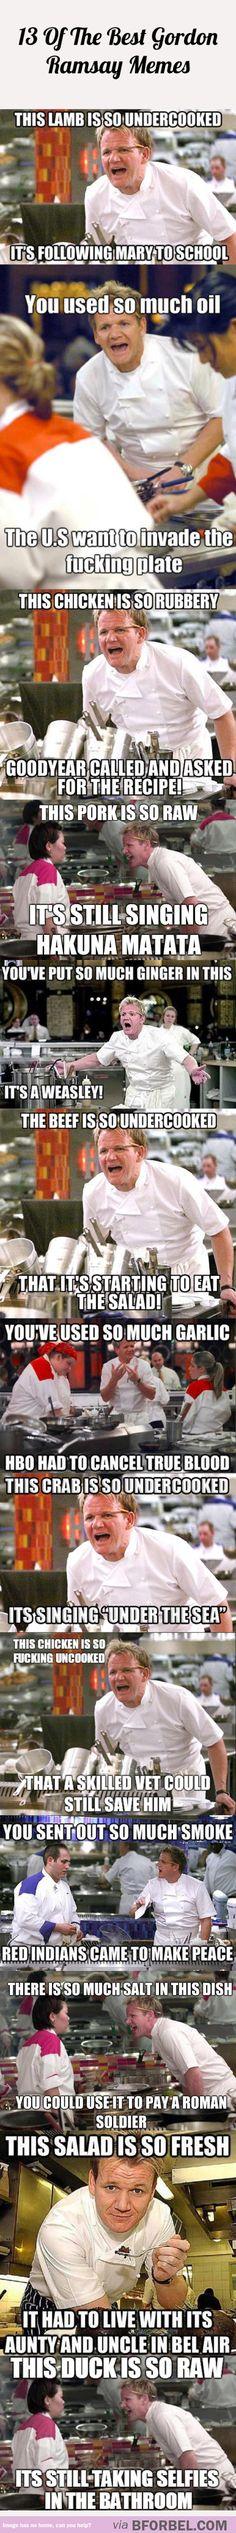 13 Of The Best Gordon Ramsay Memes…